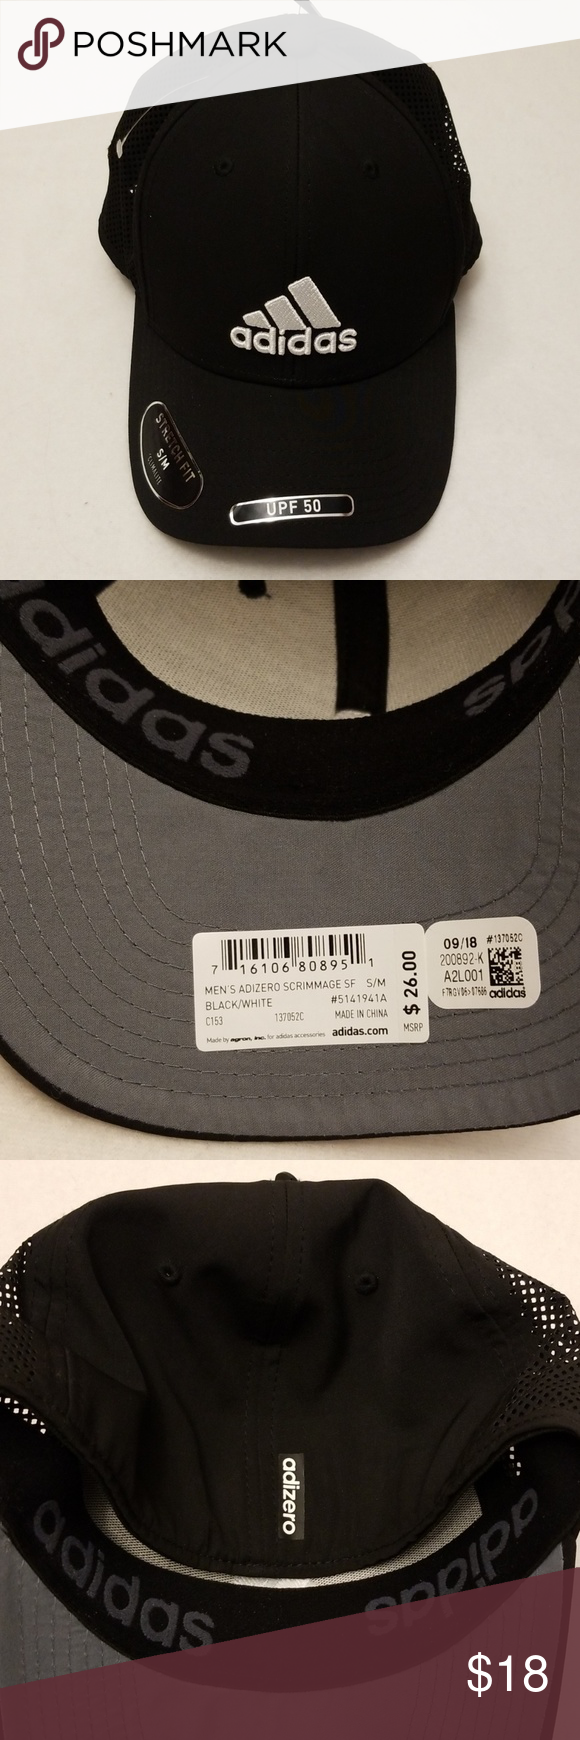 Descompostura frio gramática  Adidas black baseball hat, S/M NWT | Black adidas, Adidas women, Adidas